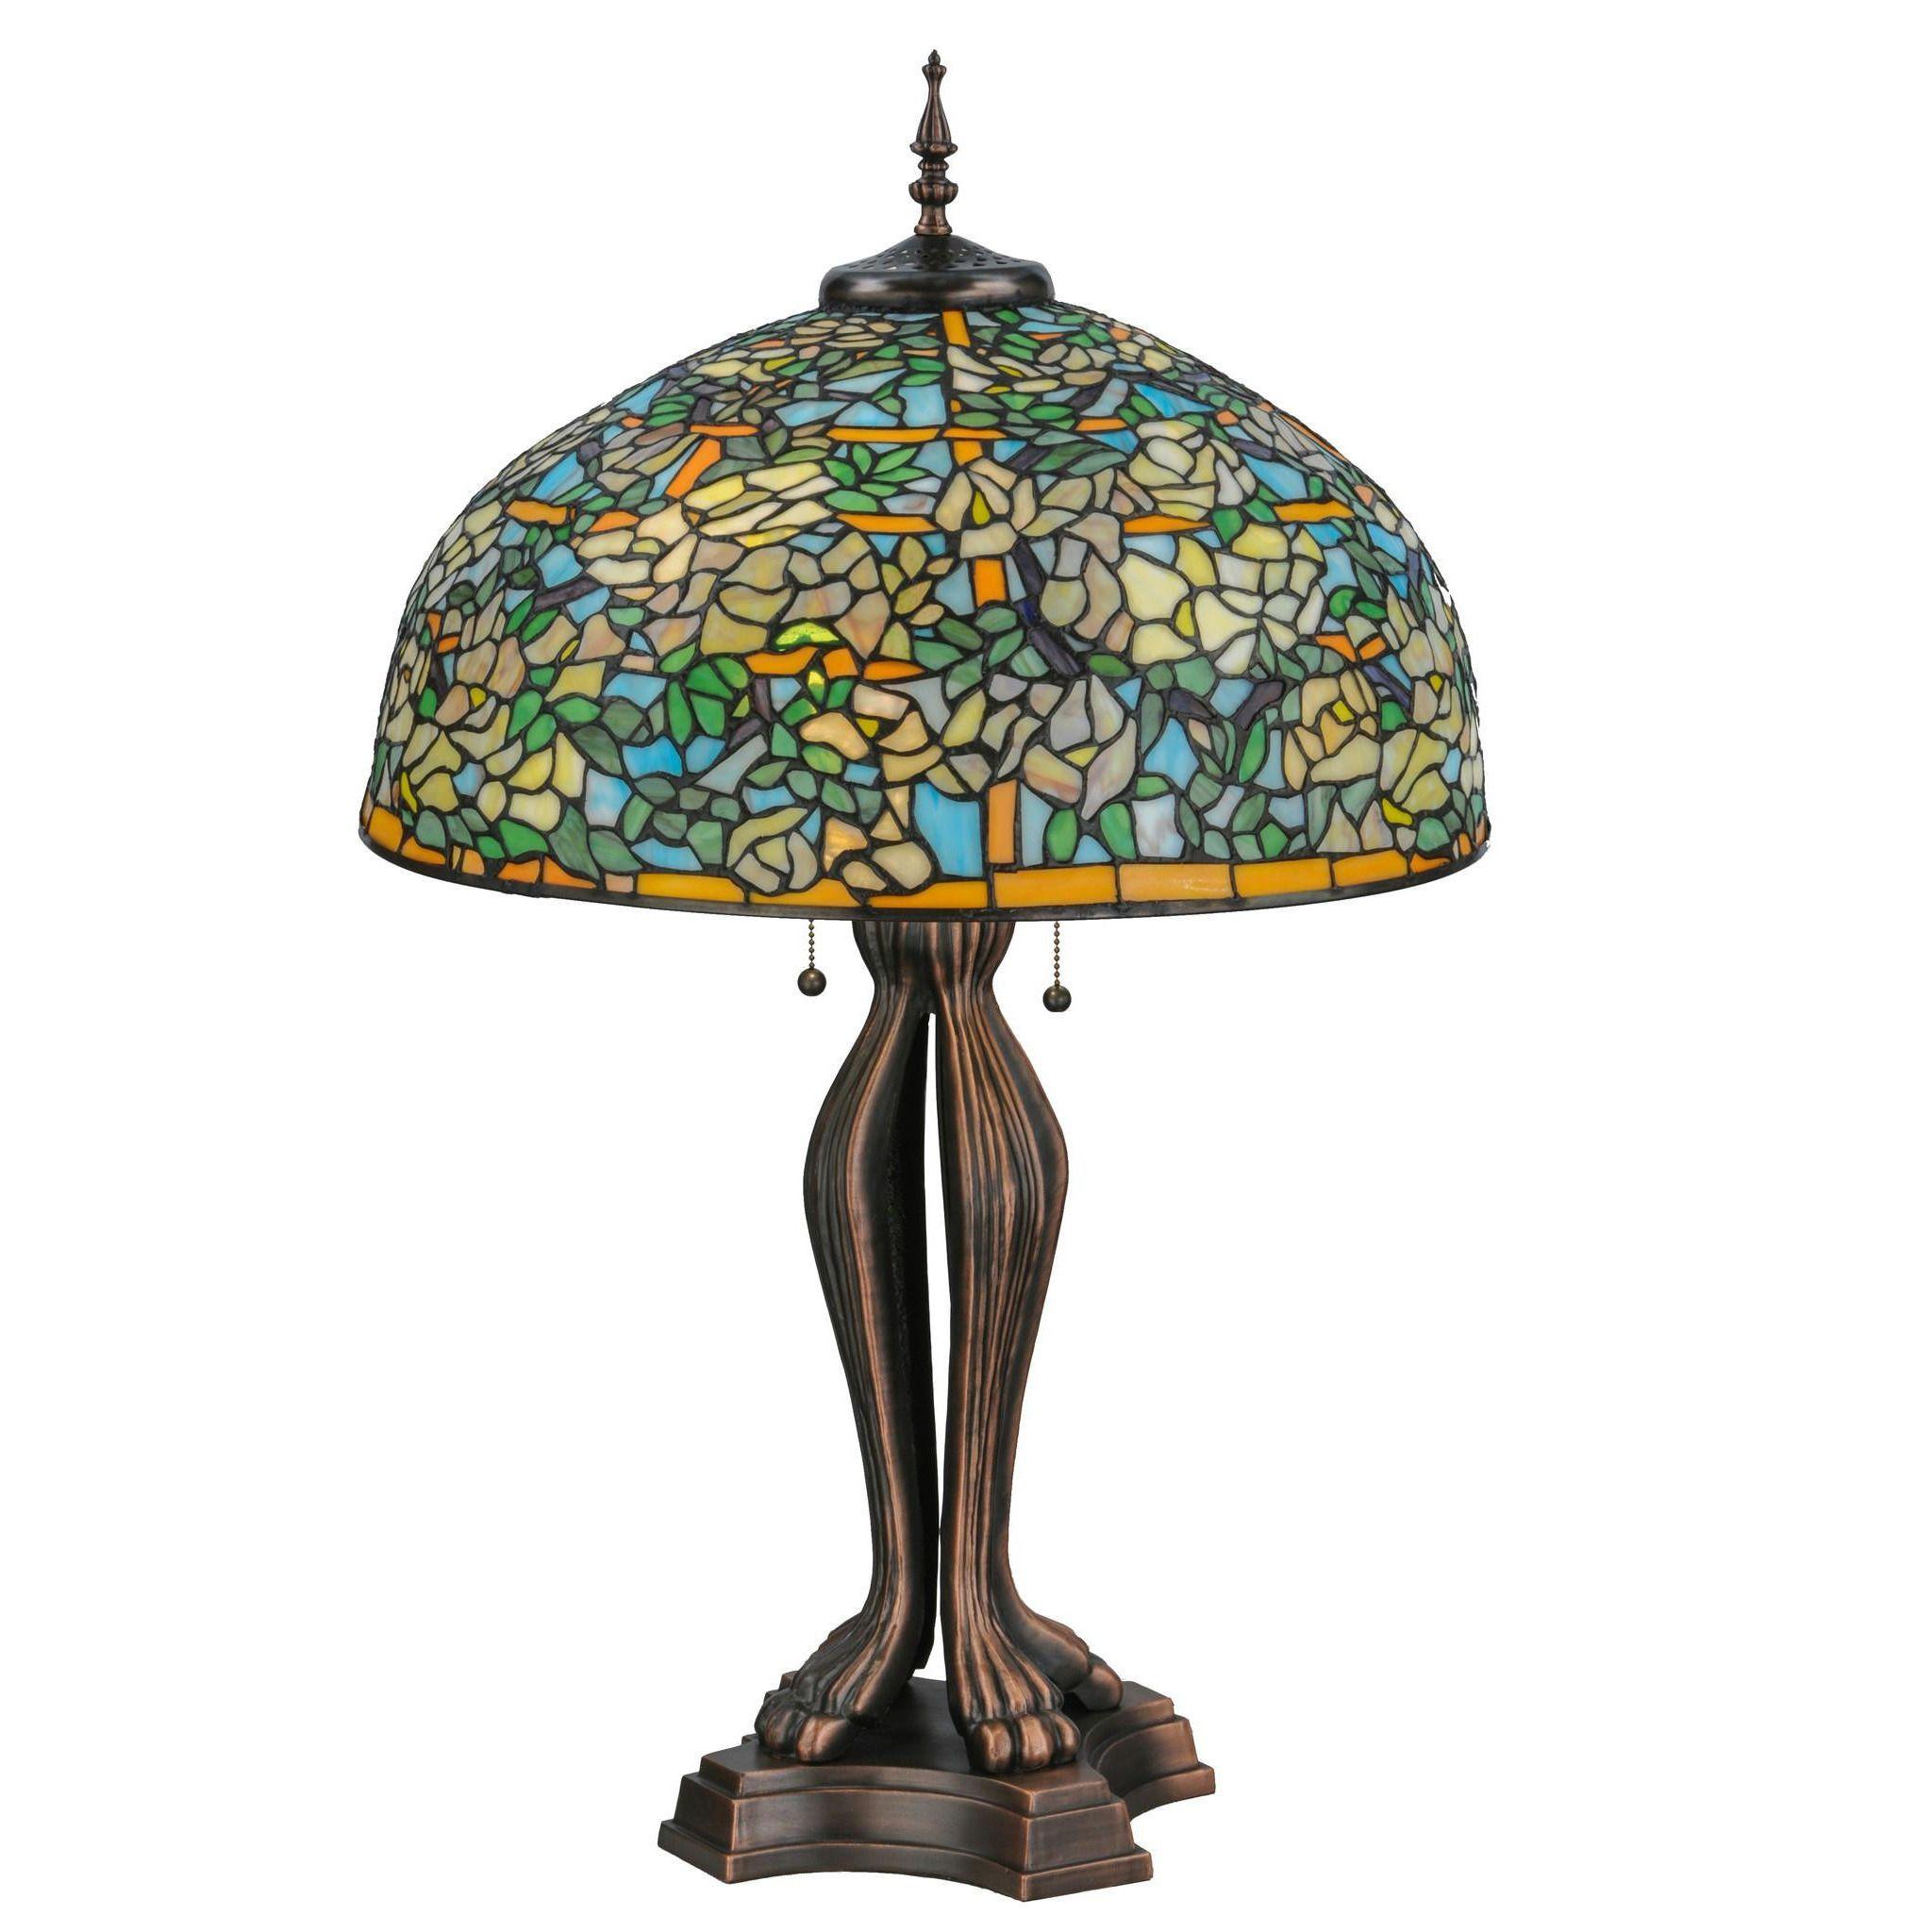 36 Inch H Tiffany Laburnum Trellis Table Lamp